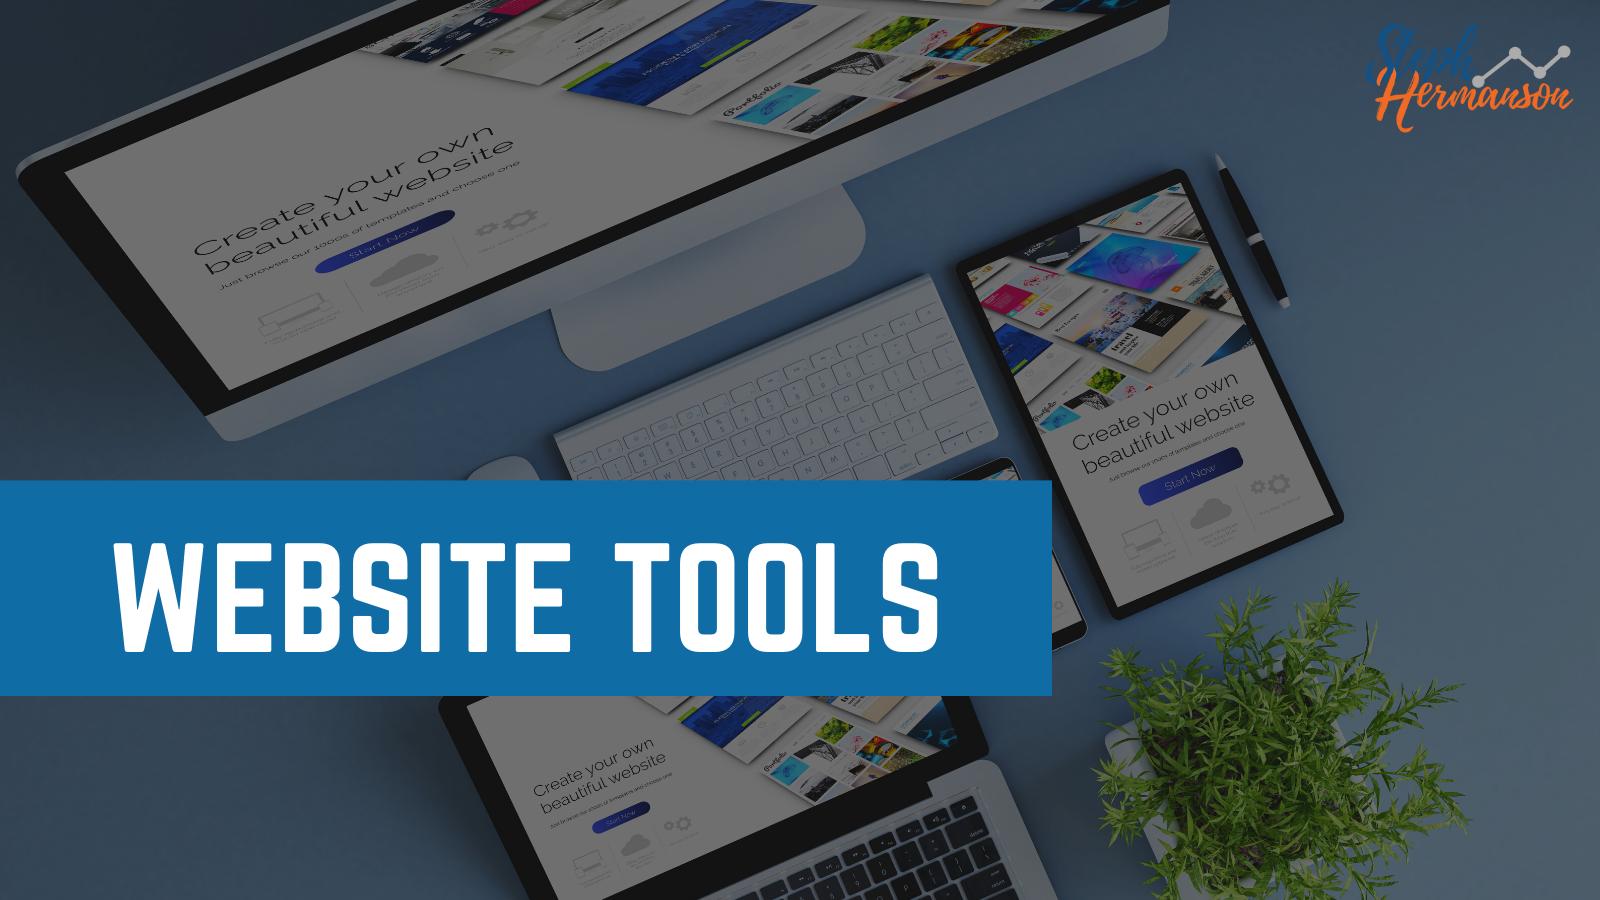 website tools digital marketing teams 2021 steph hermanson